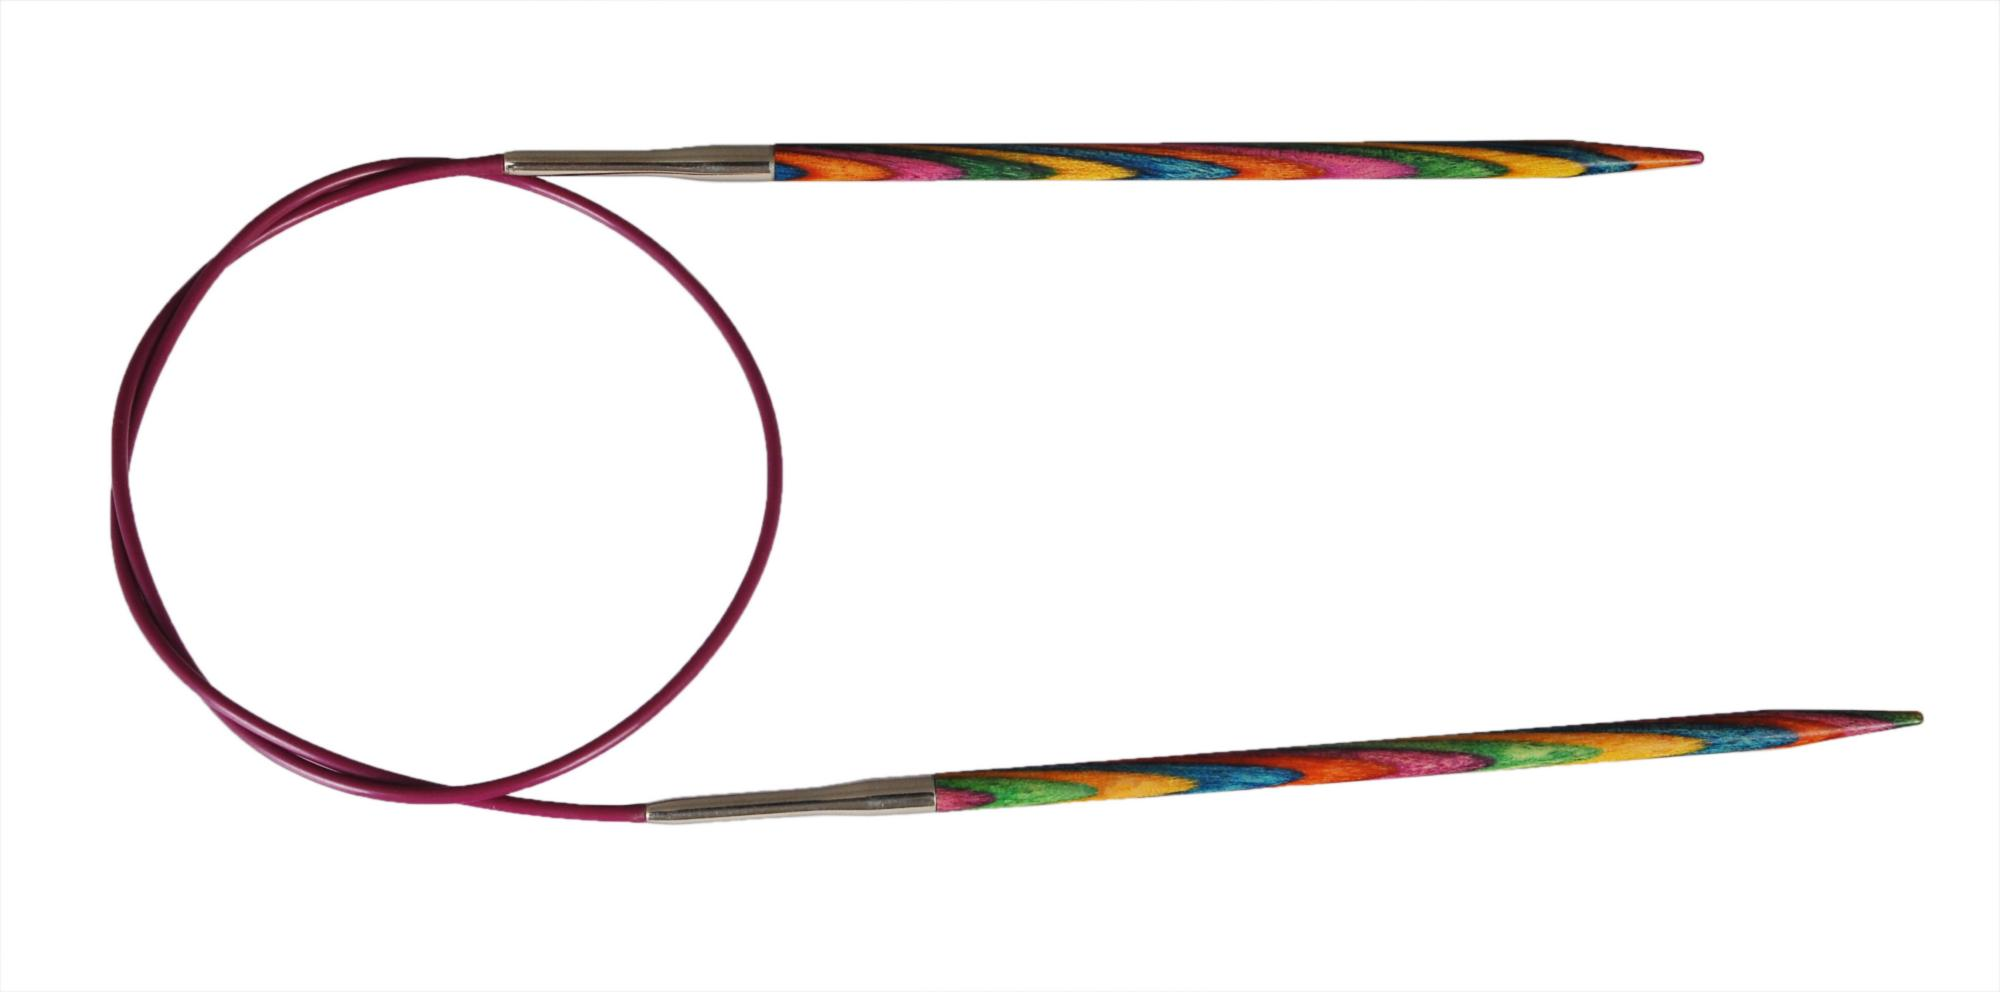 Спицы круговые 120 см Symfonie Wood KnitPro, 21374, 8.00 мм